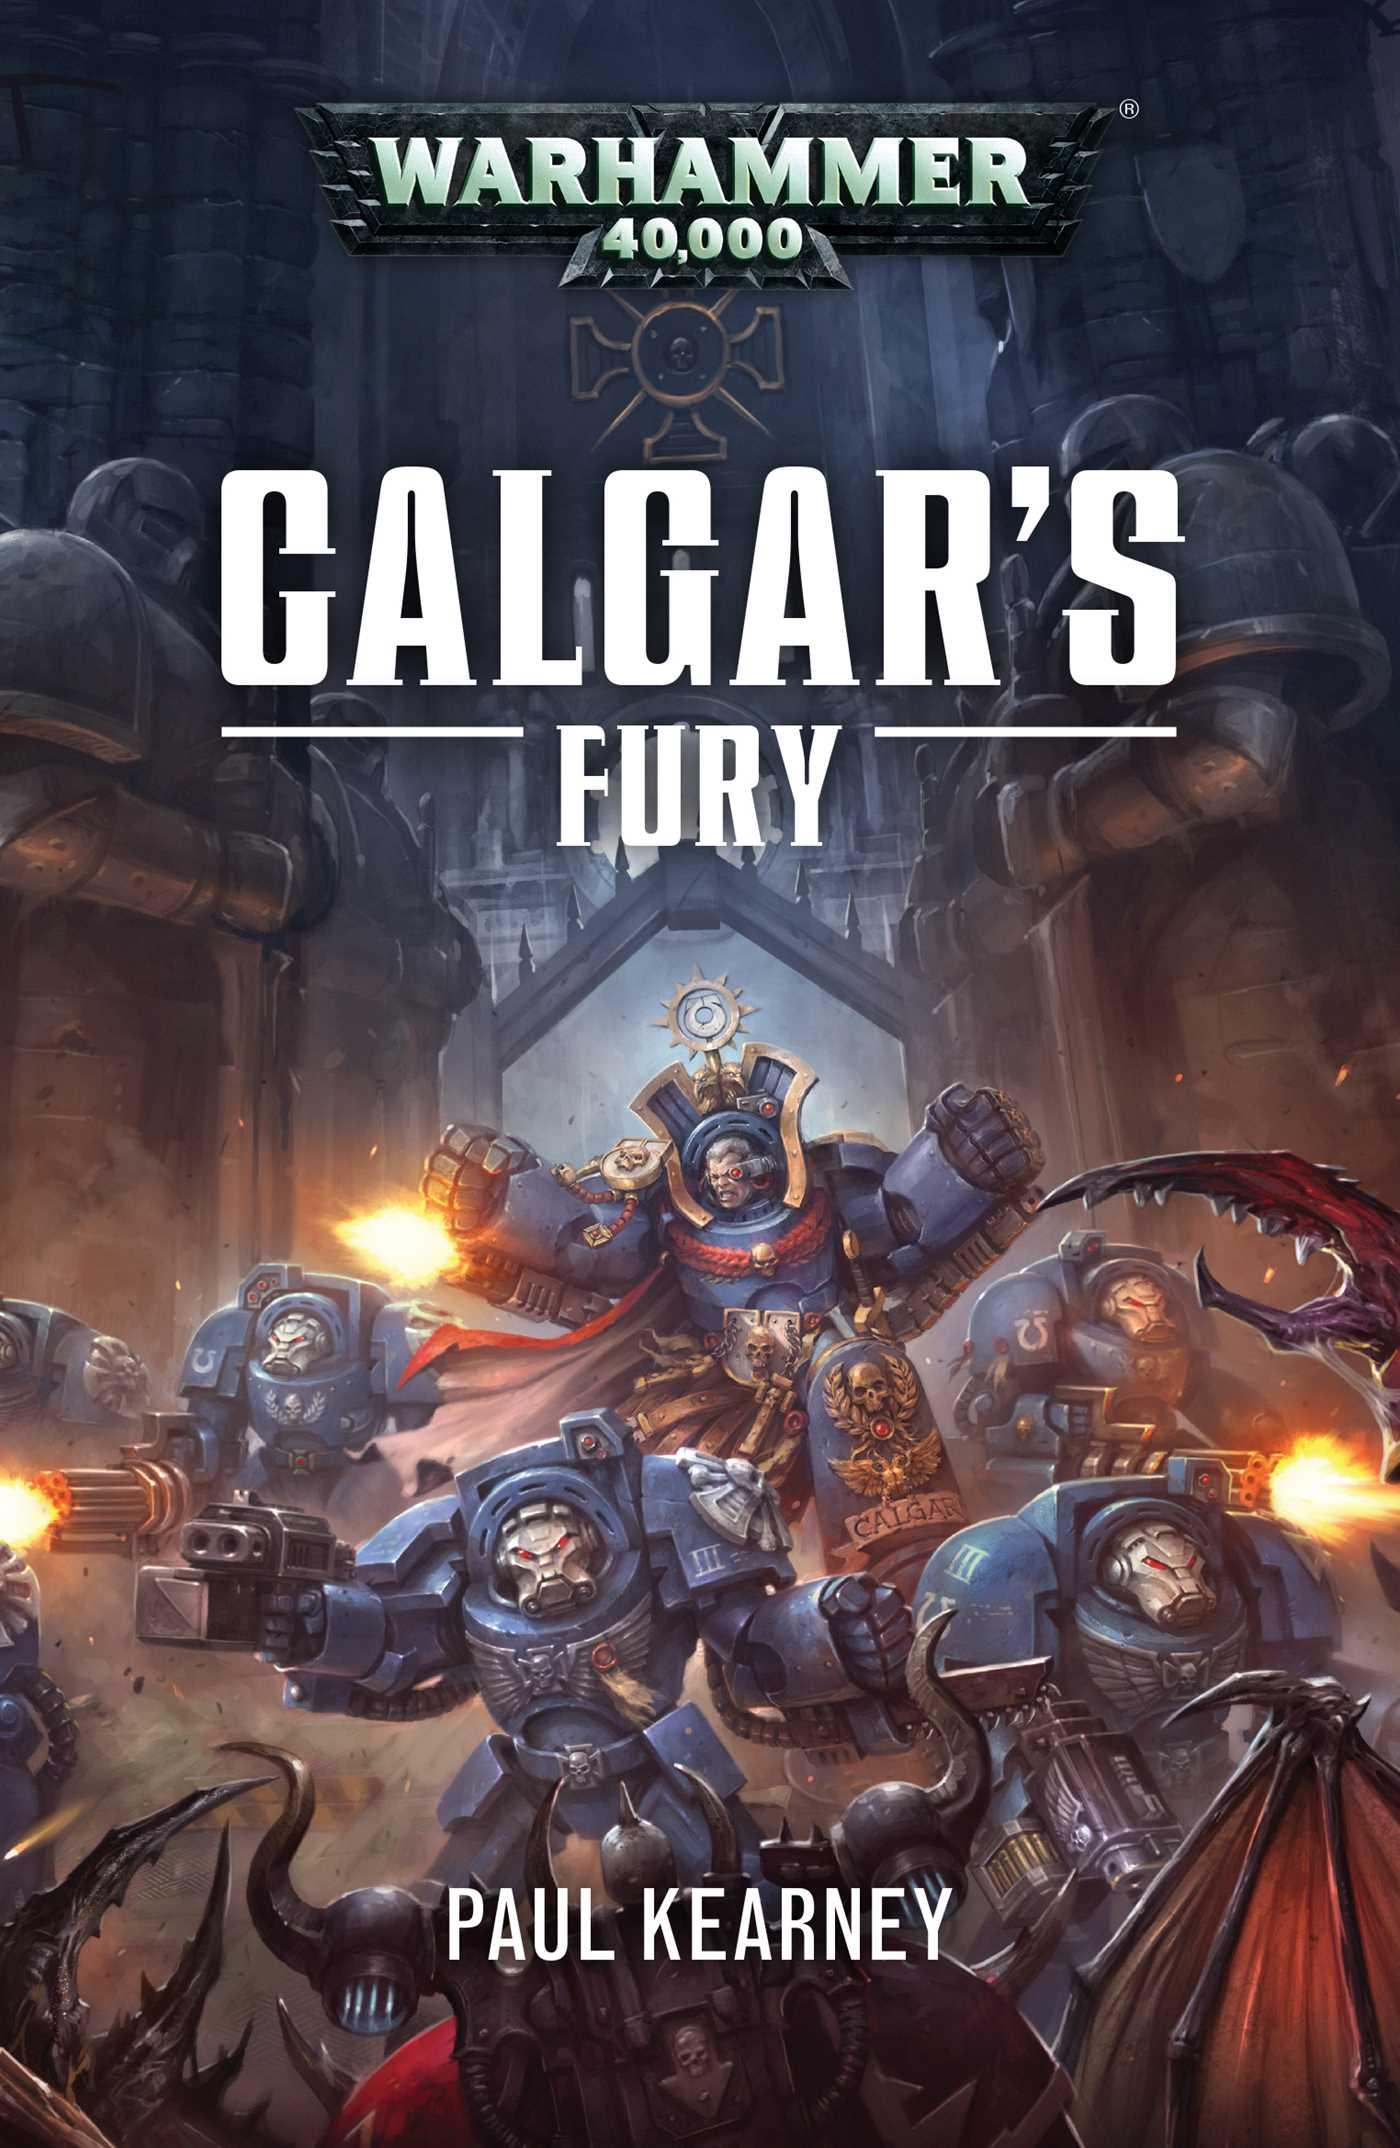 Calgars fury 9781784966096 hr